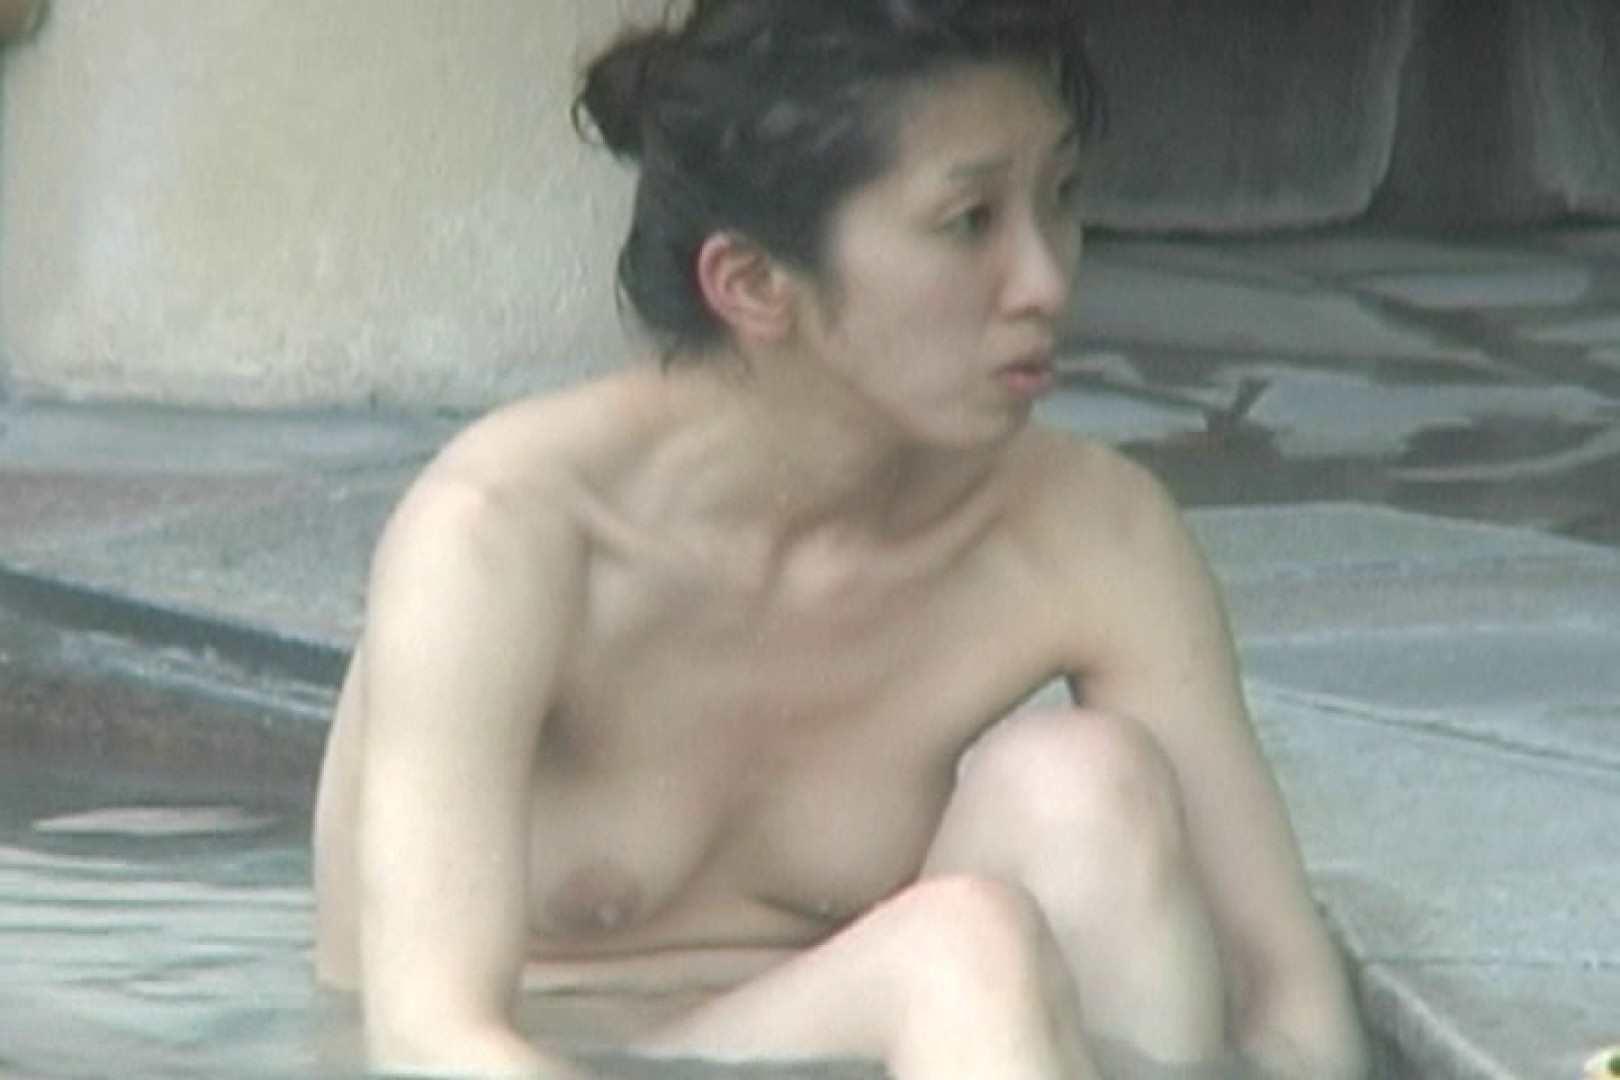 Aquaな露天風呂Vol.588 HなOL | 盗撮  66pic 9